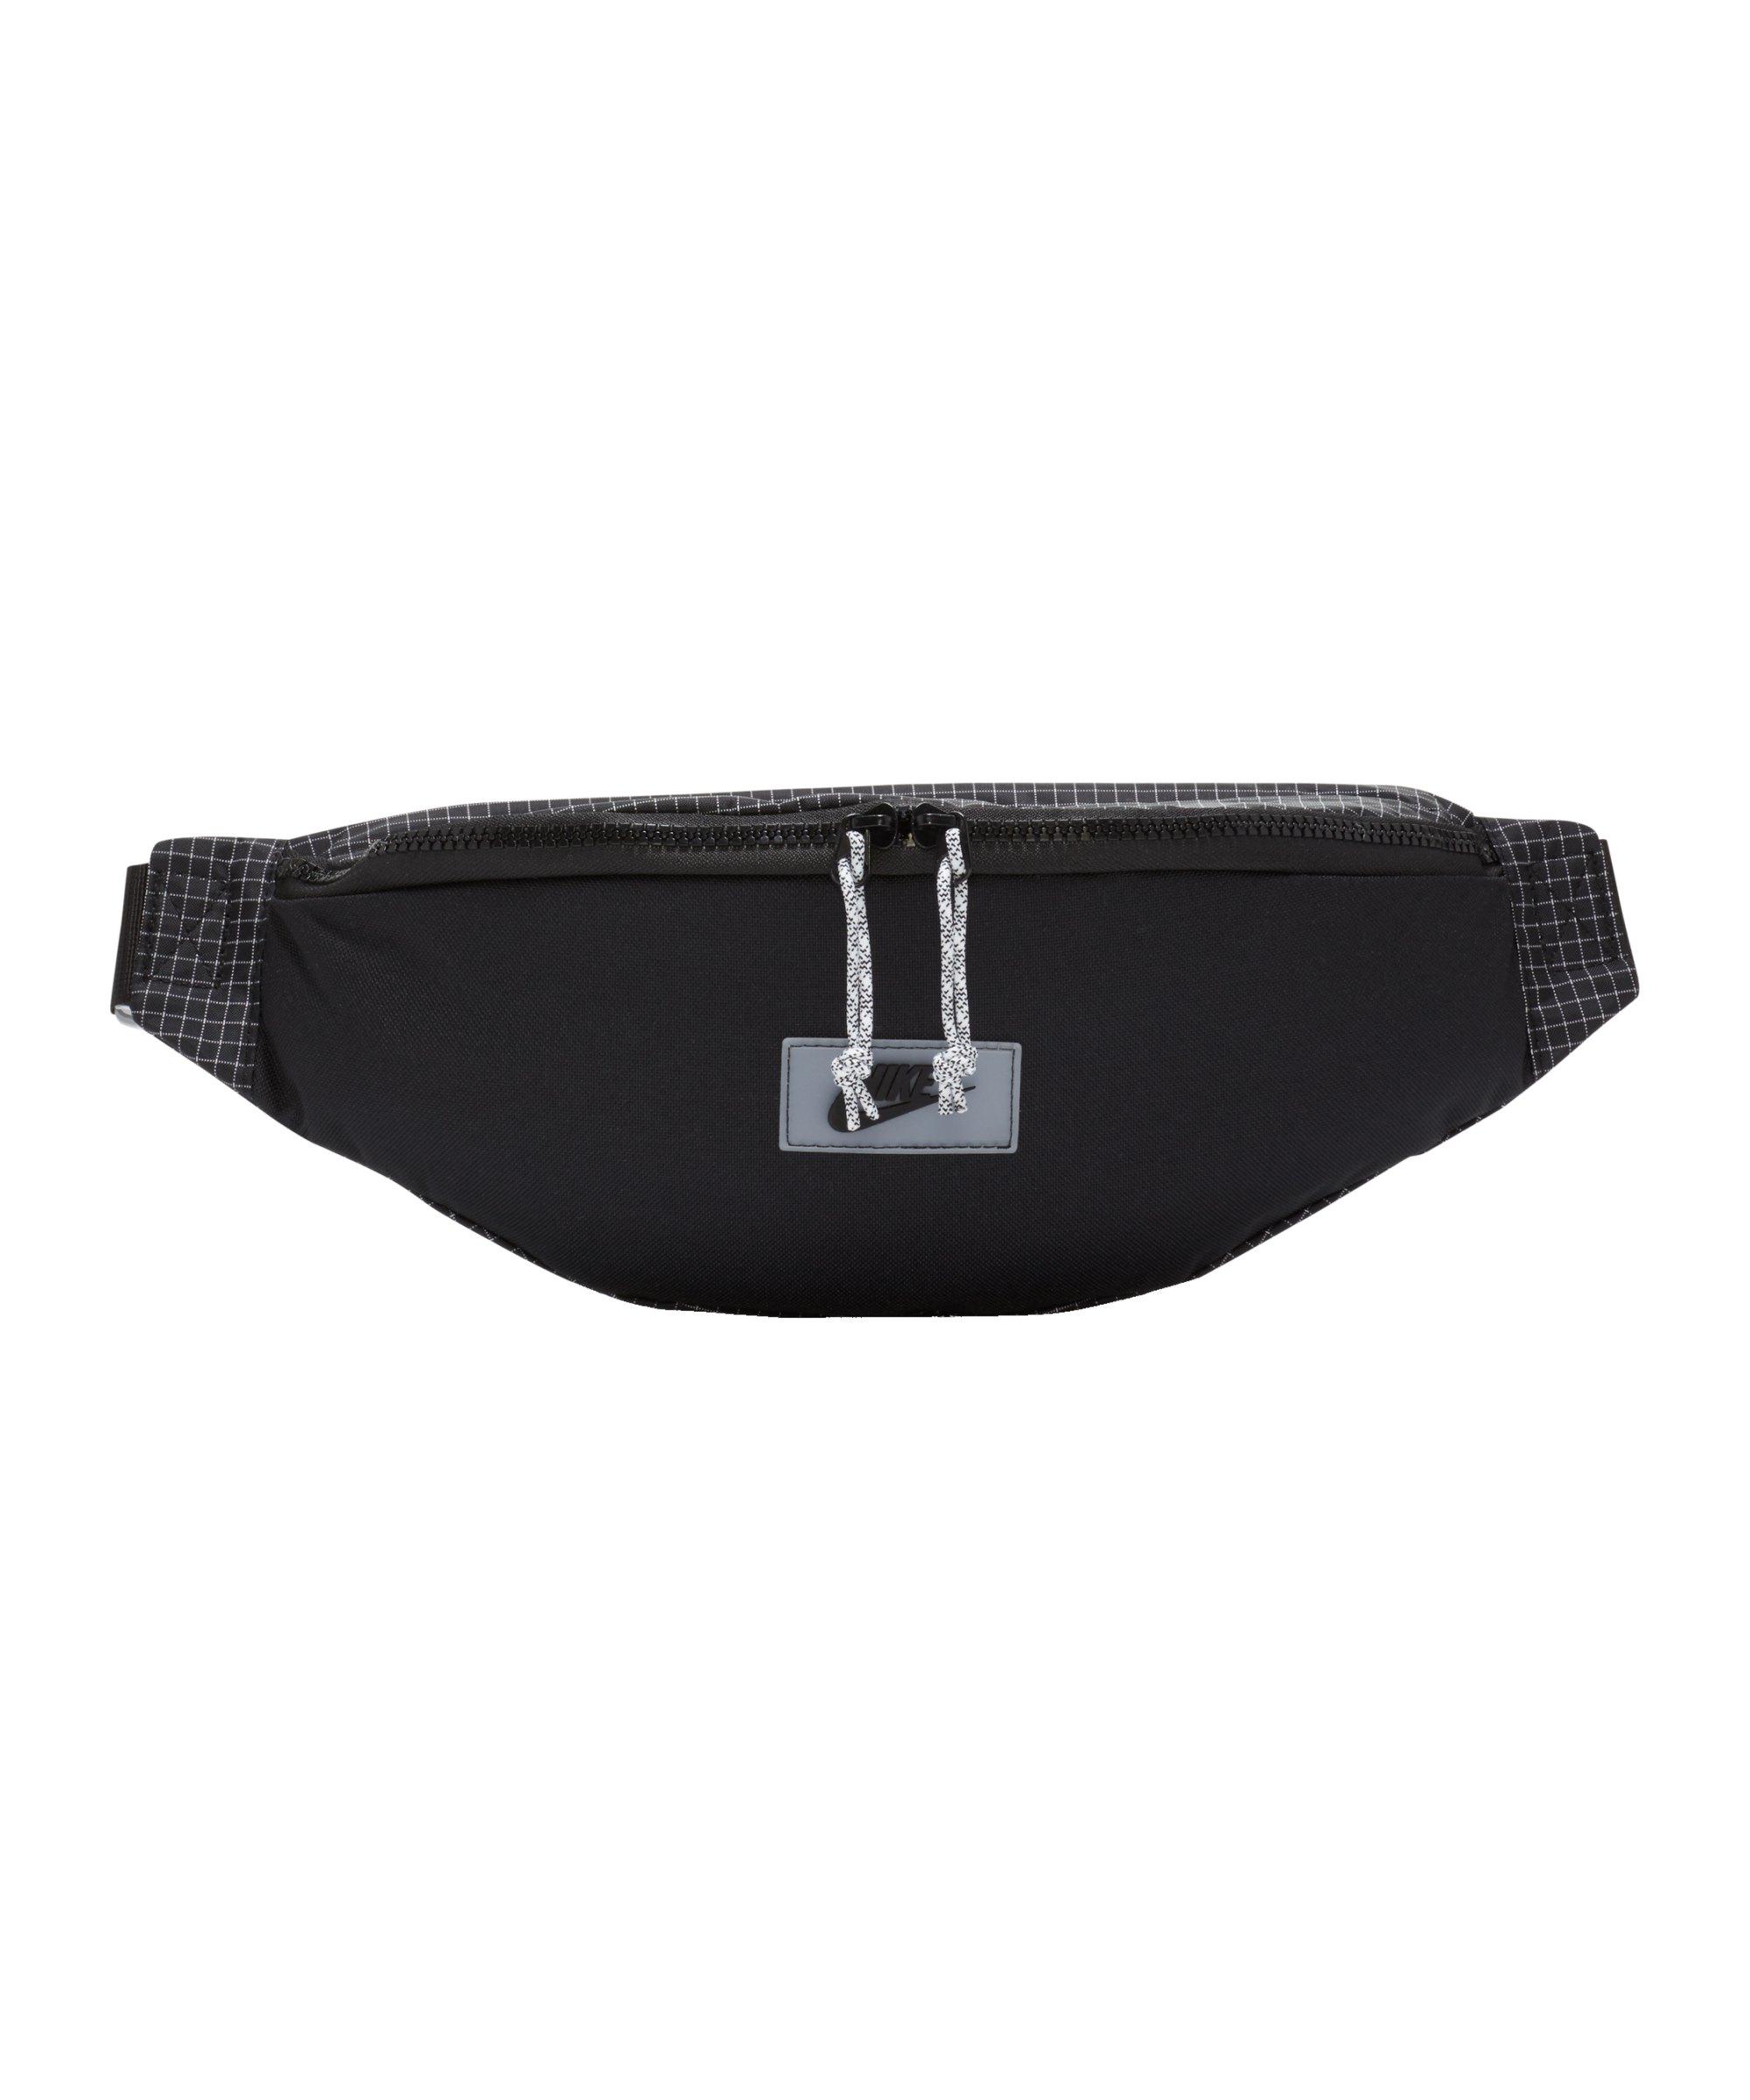 Nike Sportswear Heritage Hüfttasche Schwarz F010 - schwarz